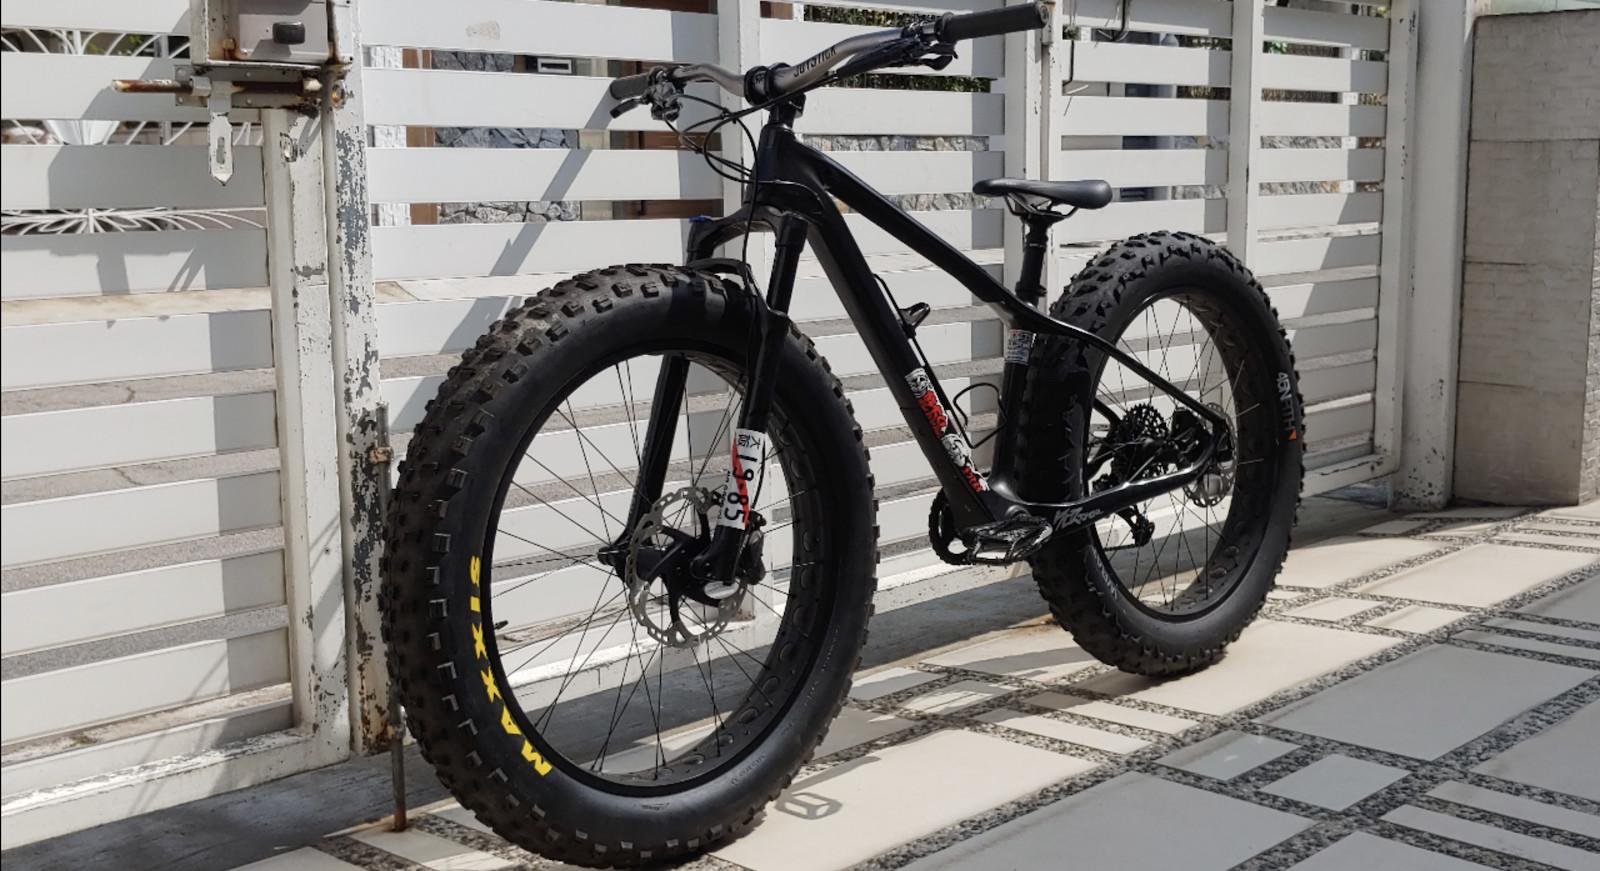 Nagasaki Industry EXS-01ZE ZEROMON Tuning Edition Carbon Fibre Fat Bike. MSRP: 6000USD